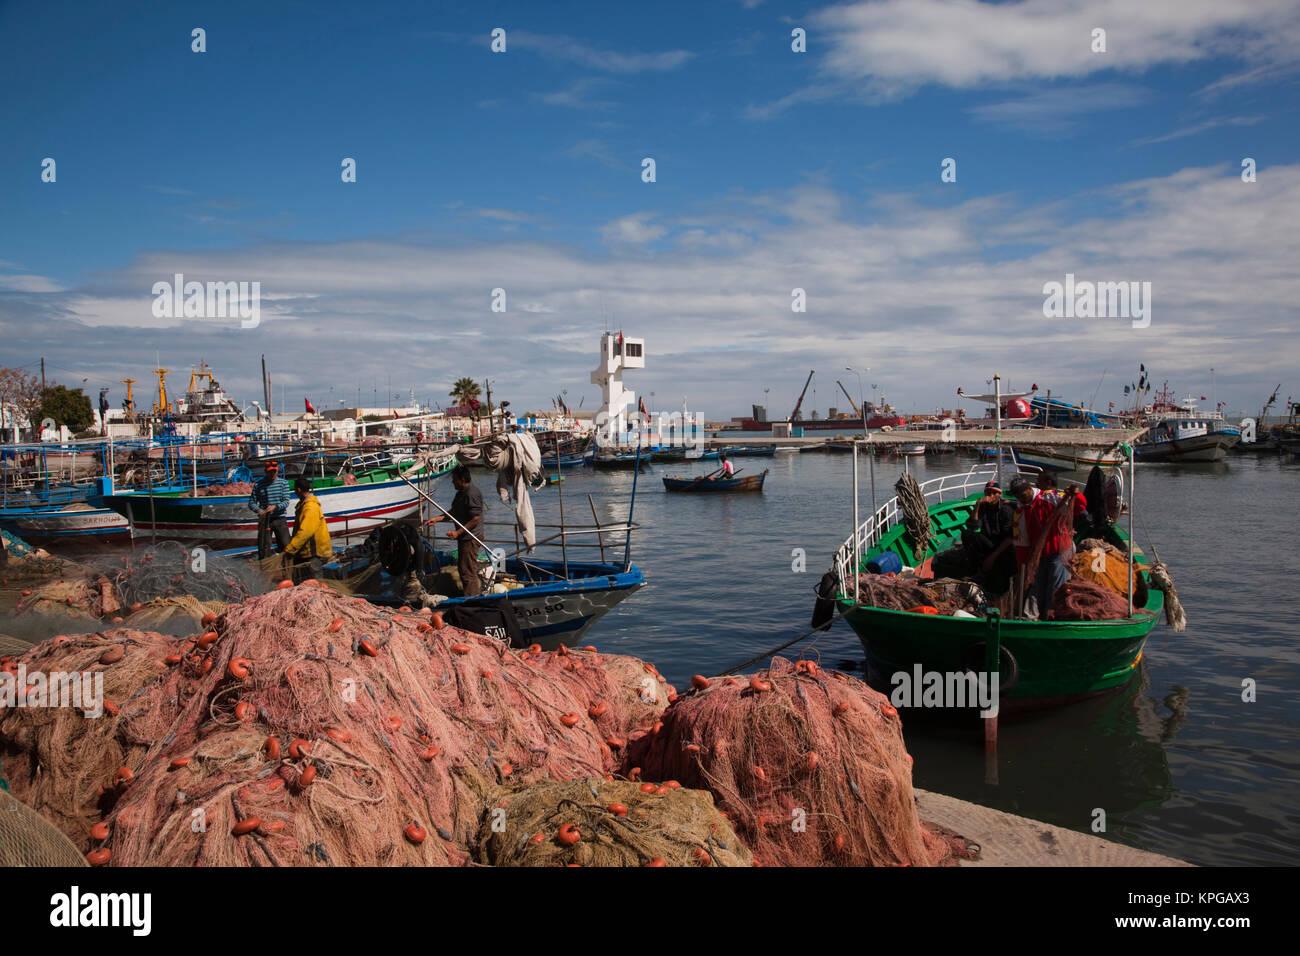 Tunisia, Tunisian Central Coast, Sousse, port, fishing boats Stock Photo